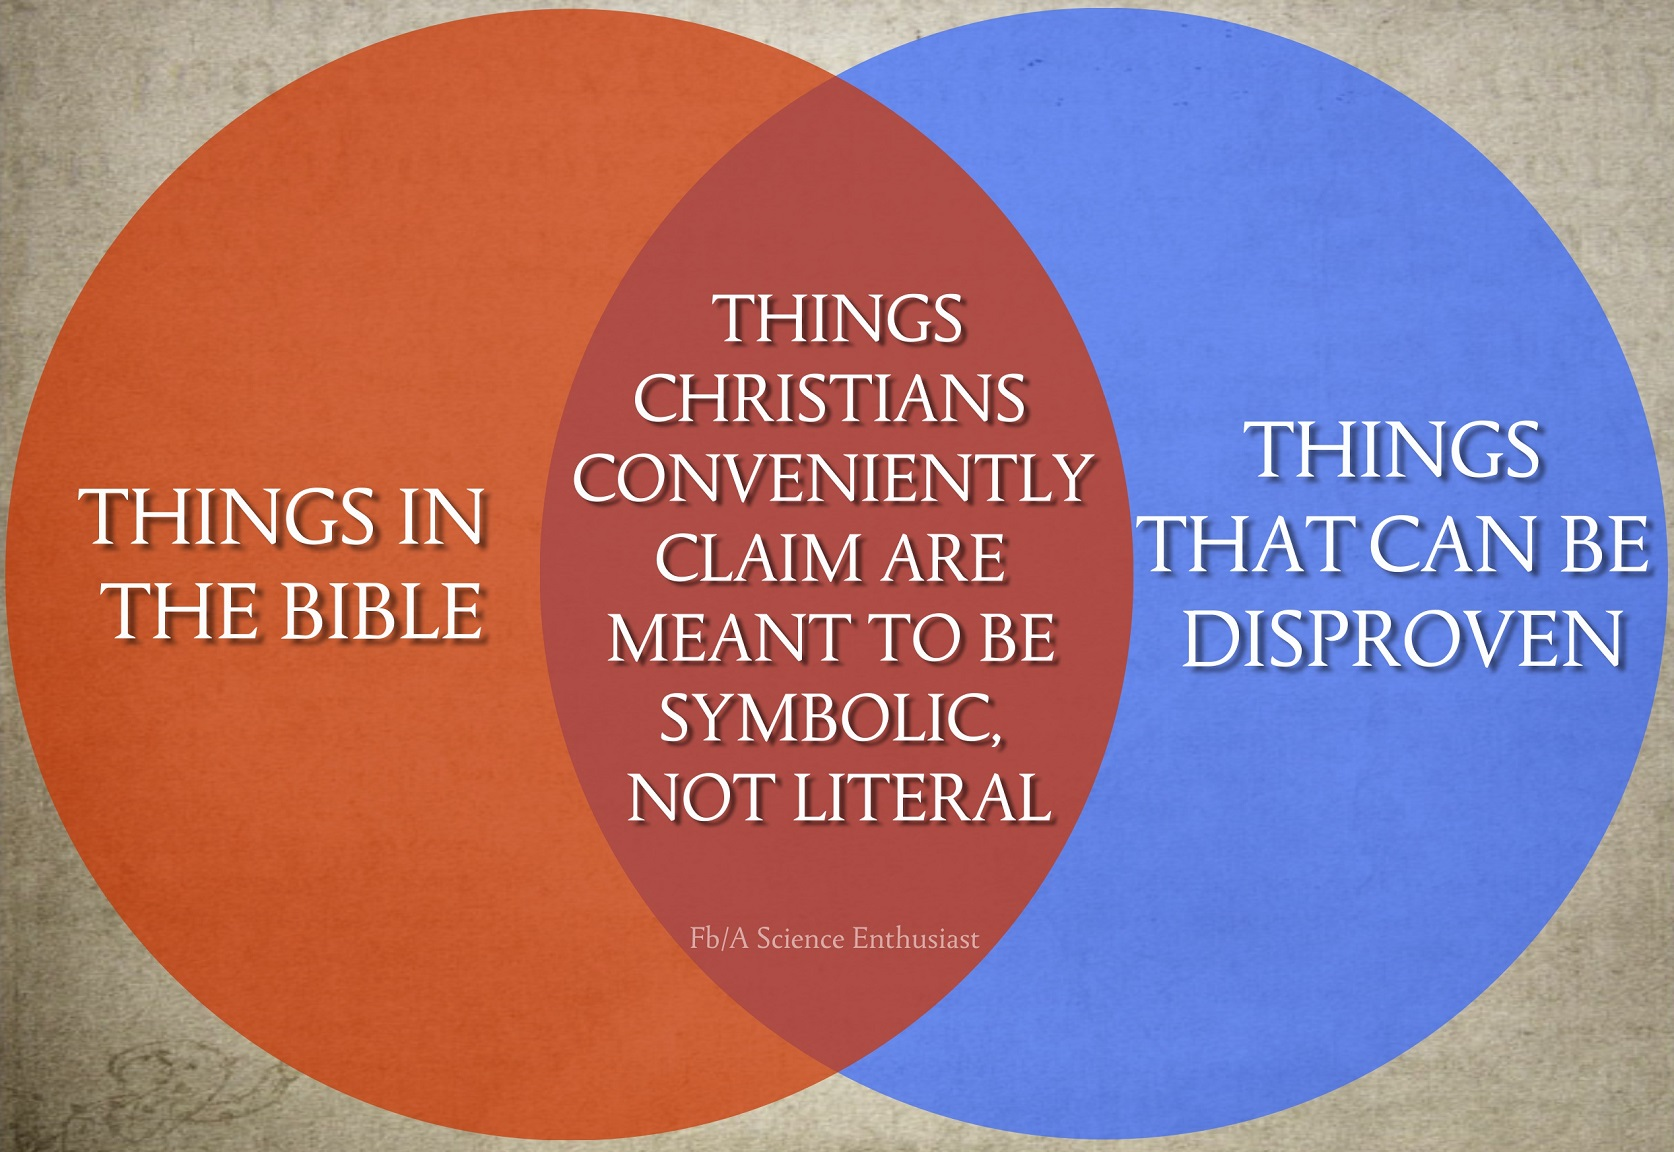 http://ascienceenthusiast.com/wp-content/uploads/2015/07/chrisitans-claim-symbolic